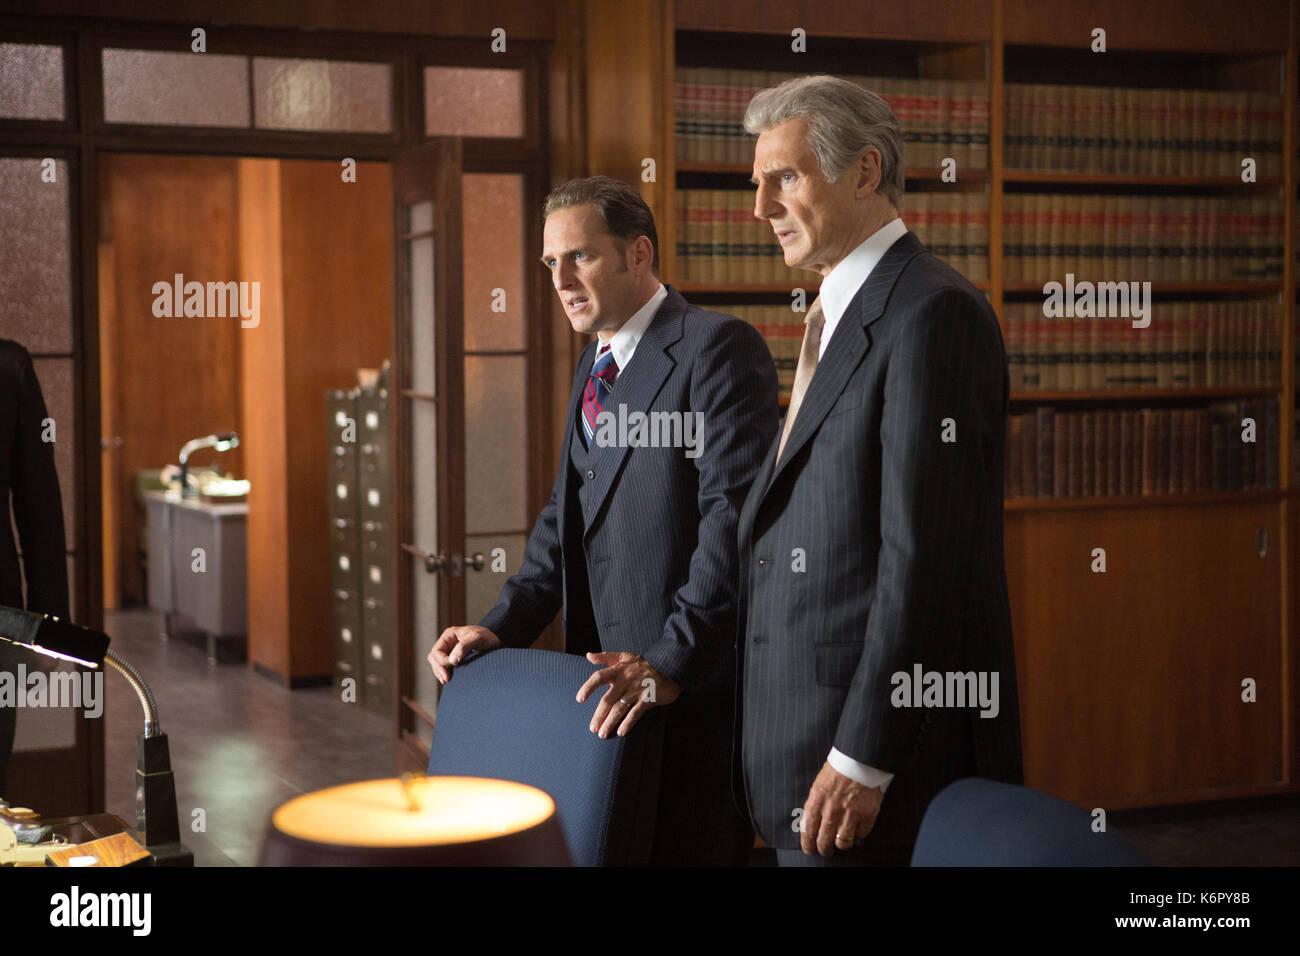 watergate scandal imágenes de stock watergate scandal fotos de